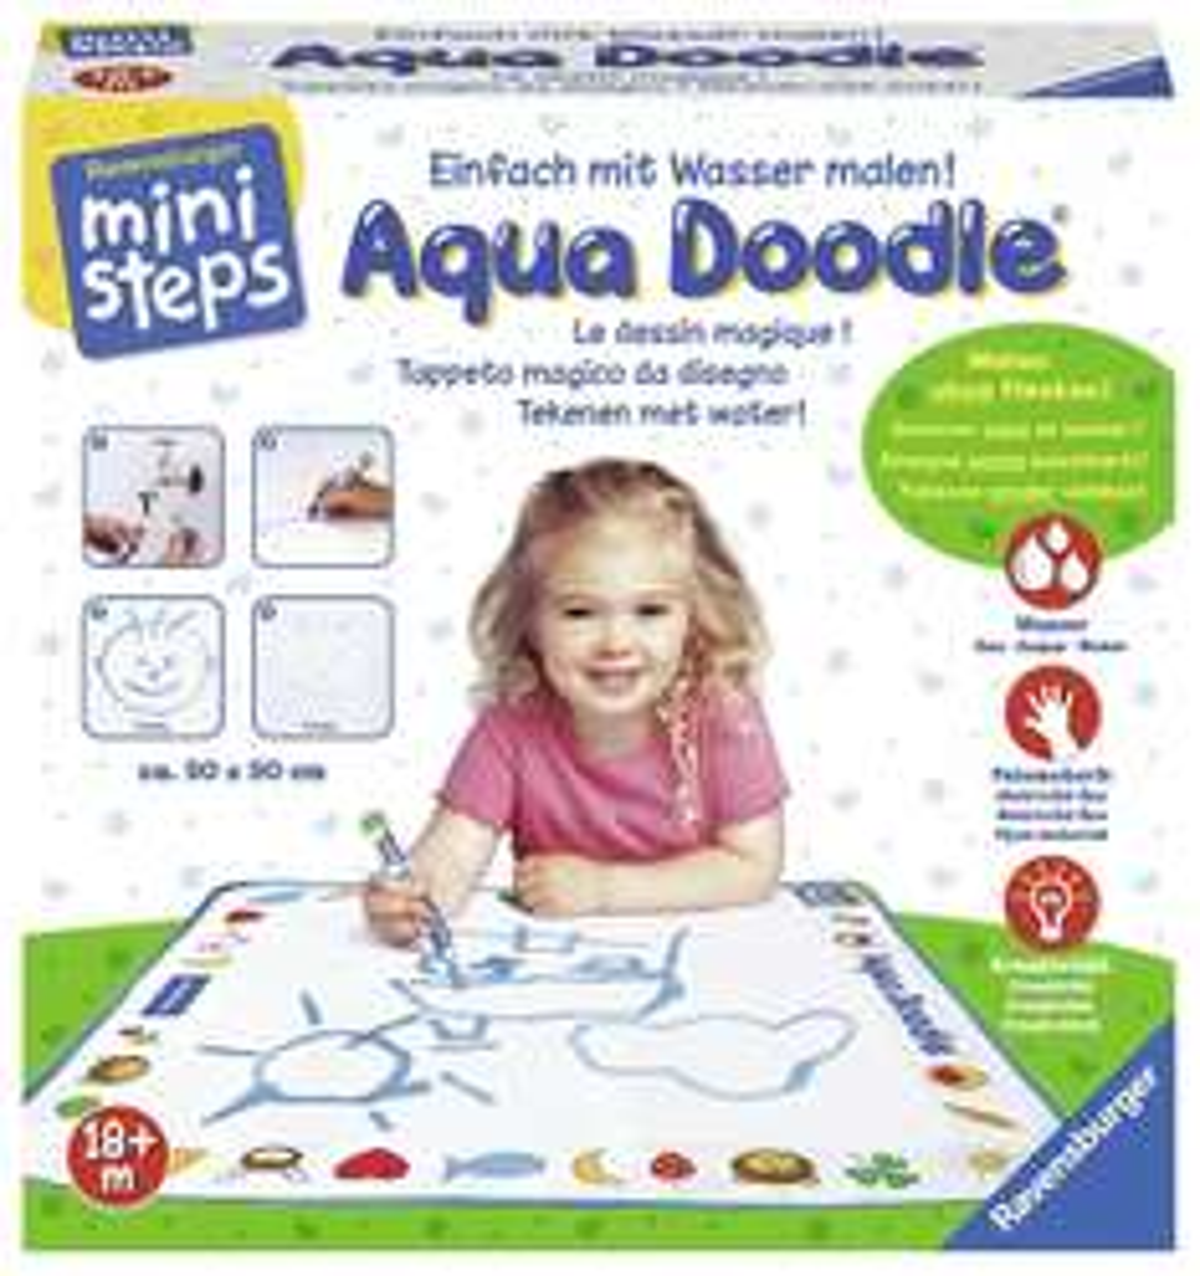 [Amazon Prime] Ravensburger 00489 - ministep Aqua Doodle für 13,39€